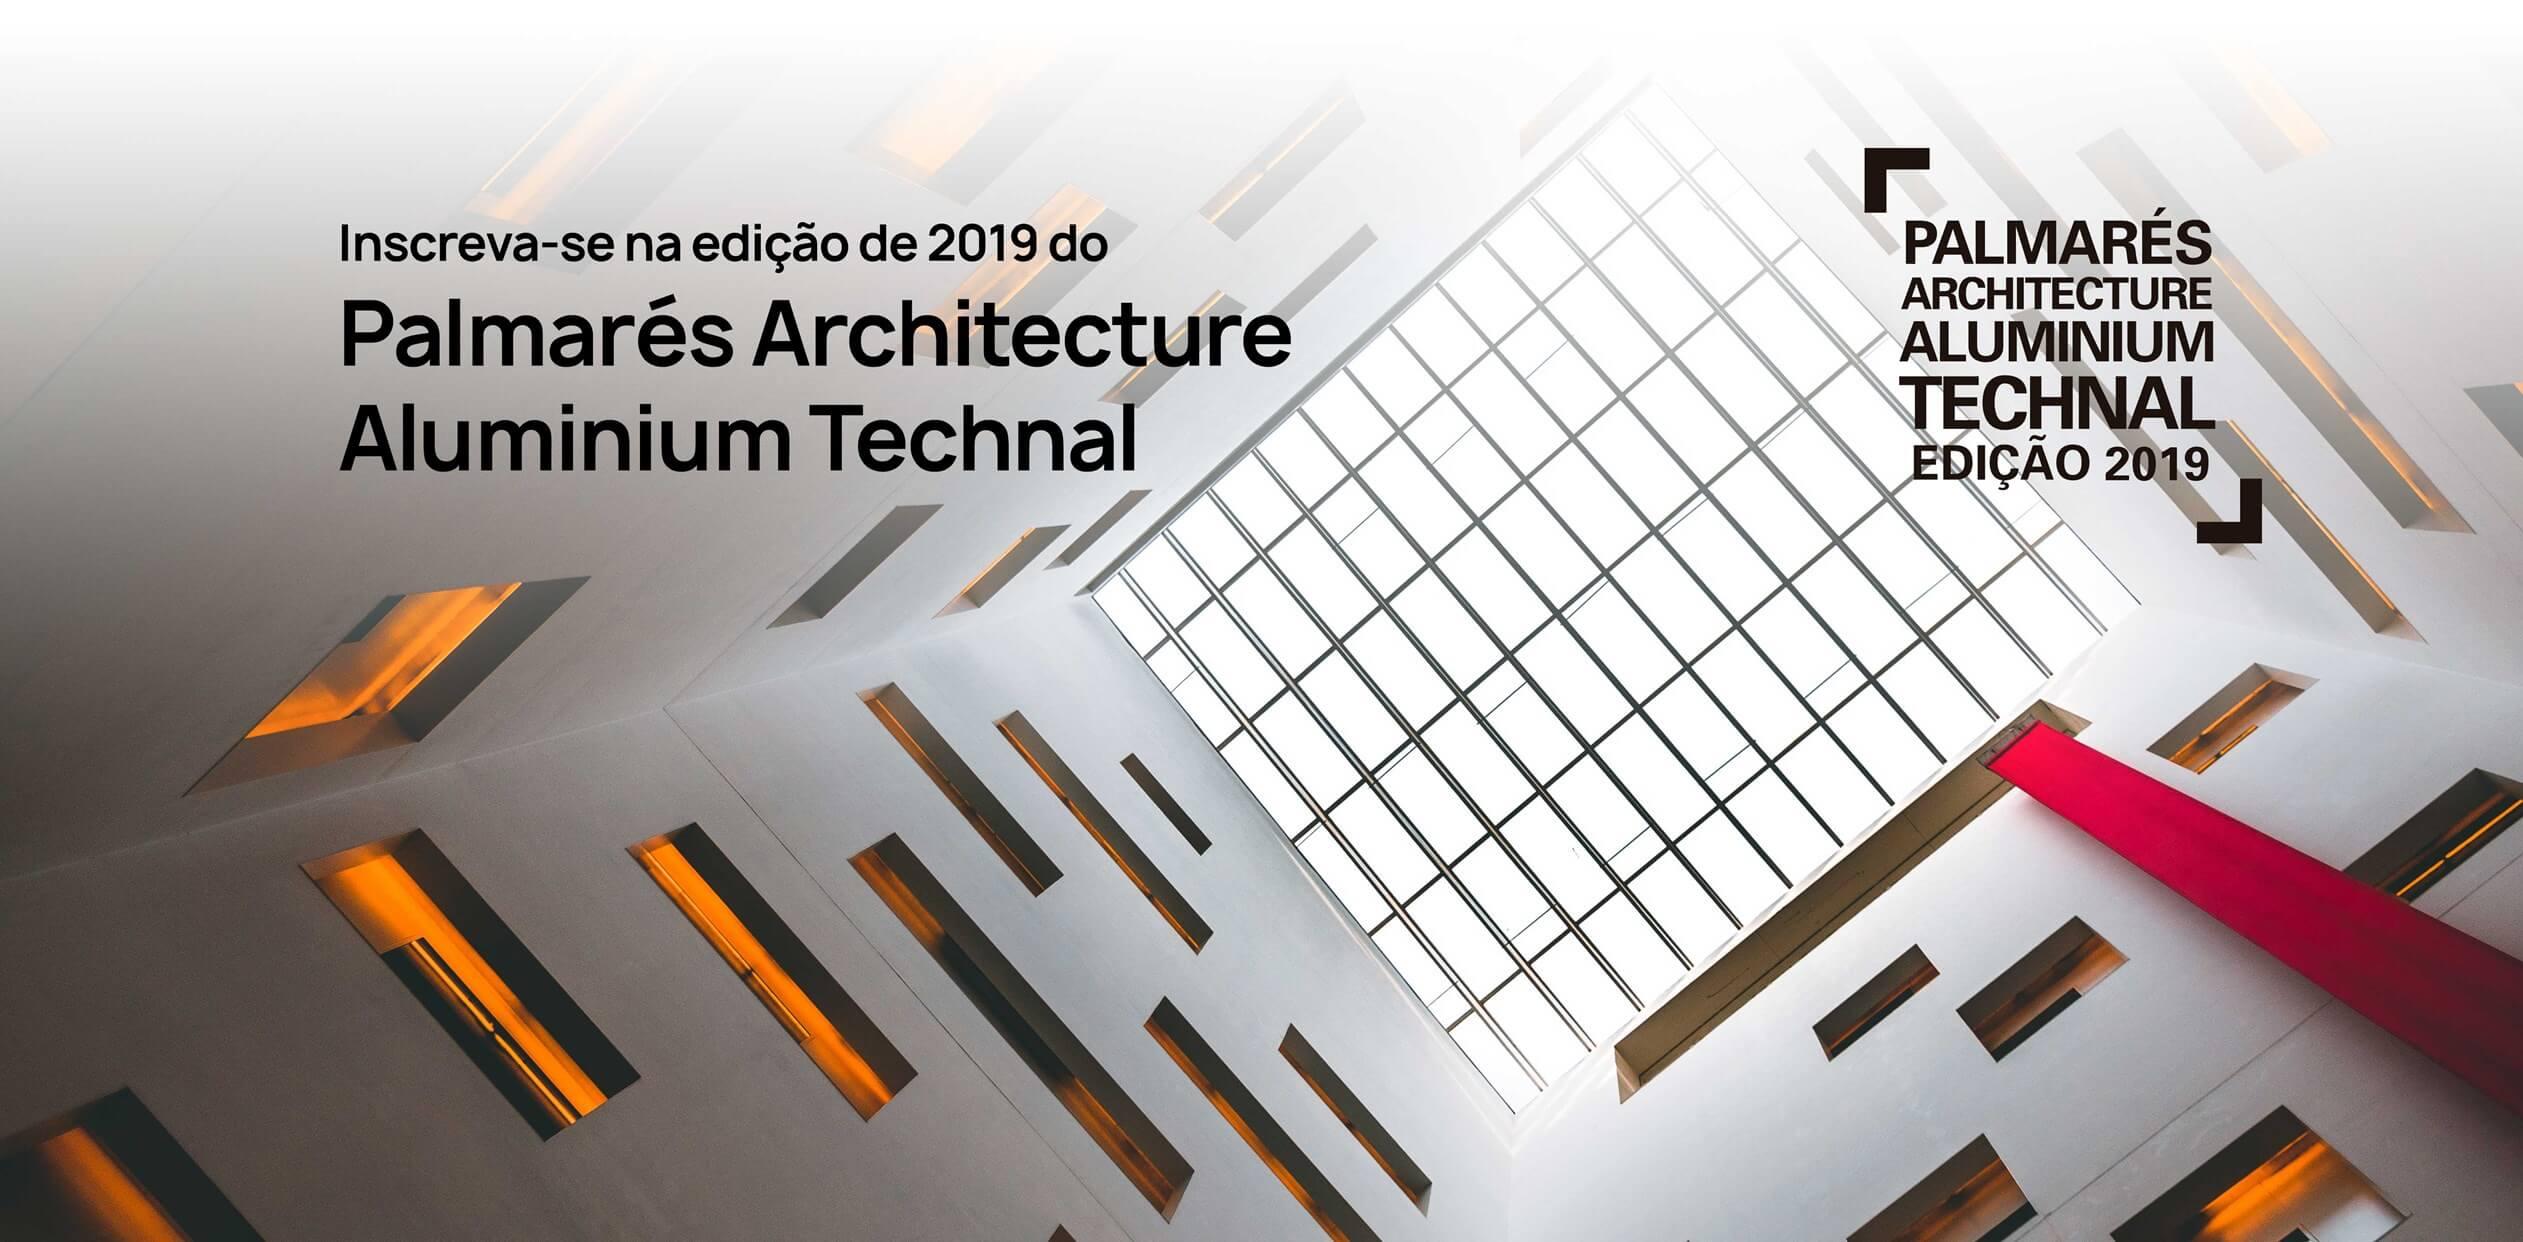 Inscrições para o Palmarés Architecture Aluminium Technal 2019 já se encontram abertas